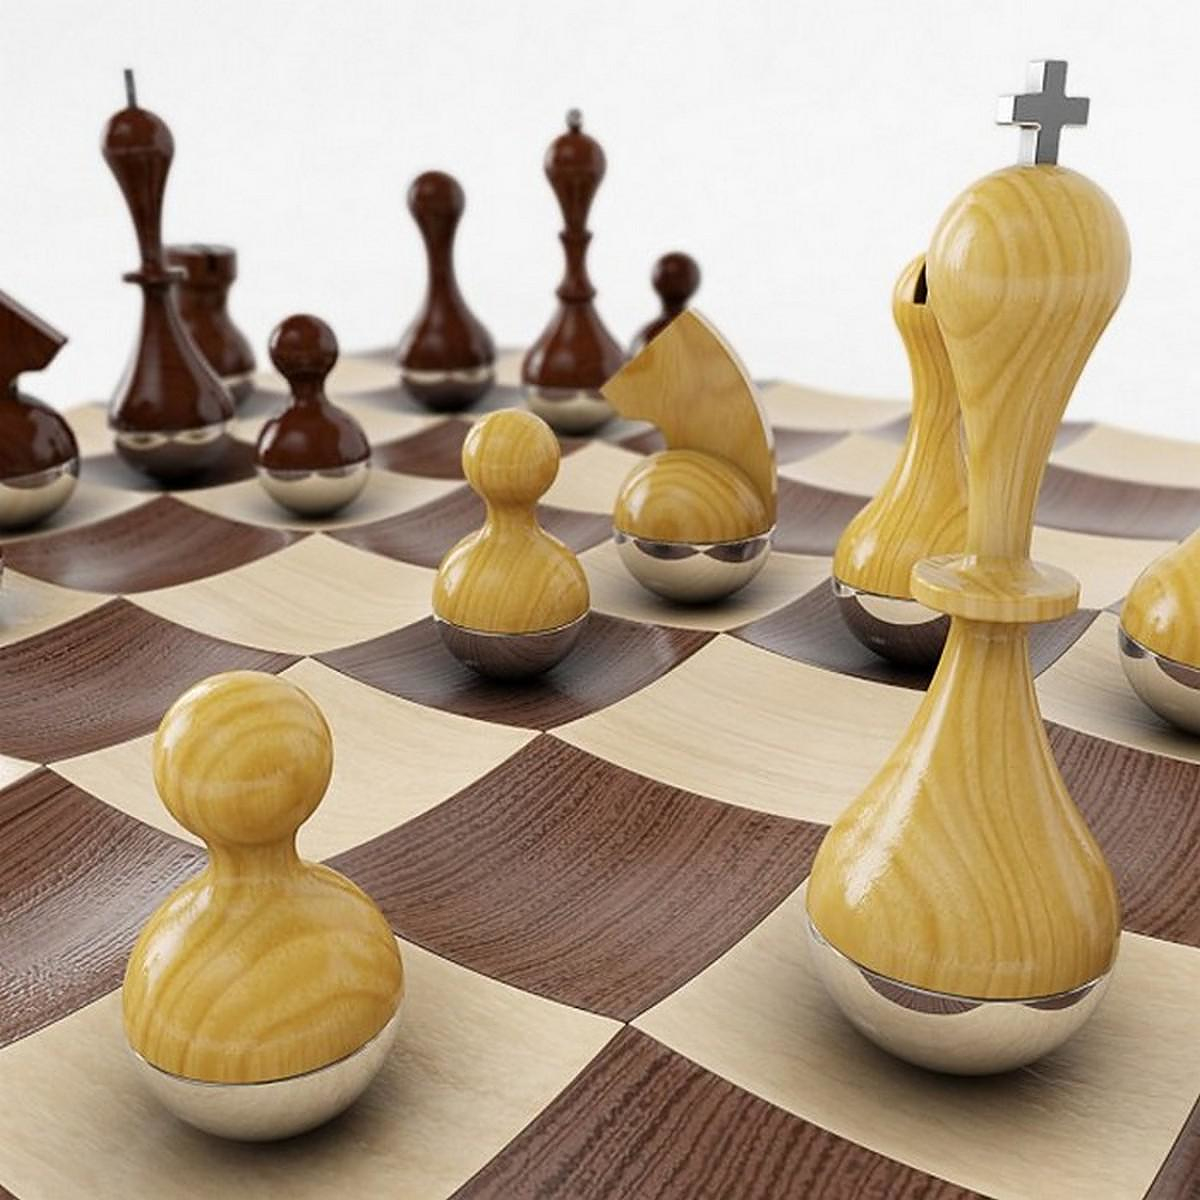 Wobble chess set by adin mumma for umbra design is this - Wobble chess set by umbra ...